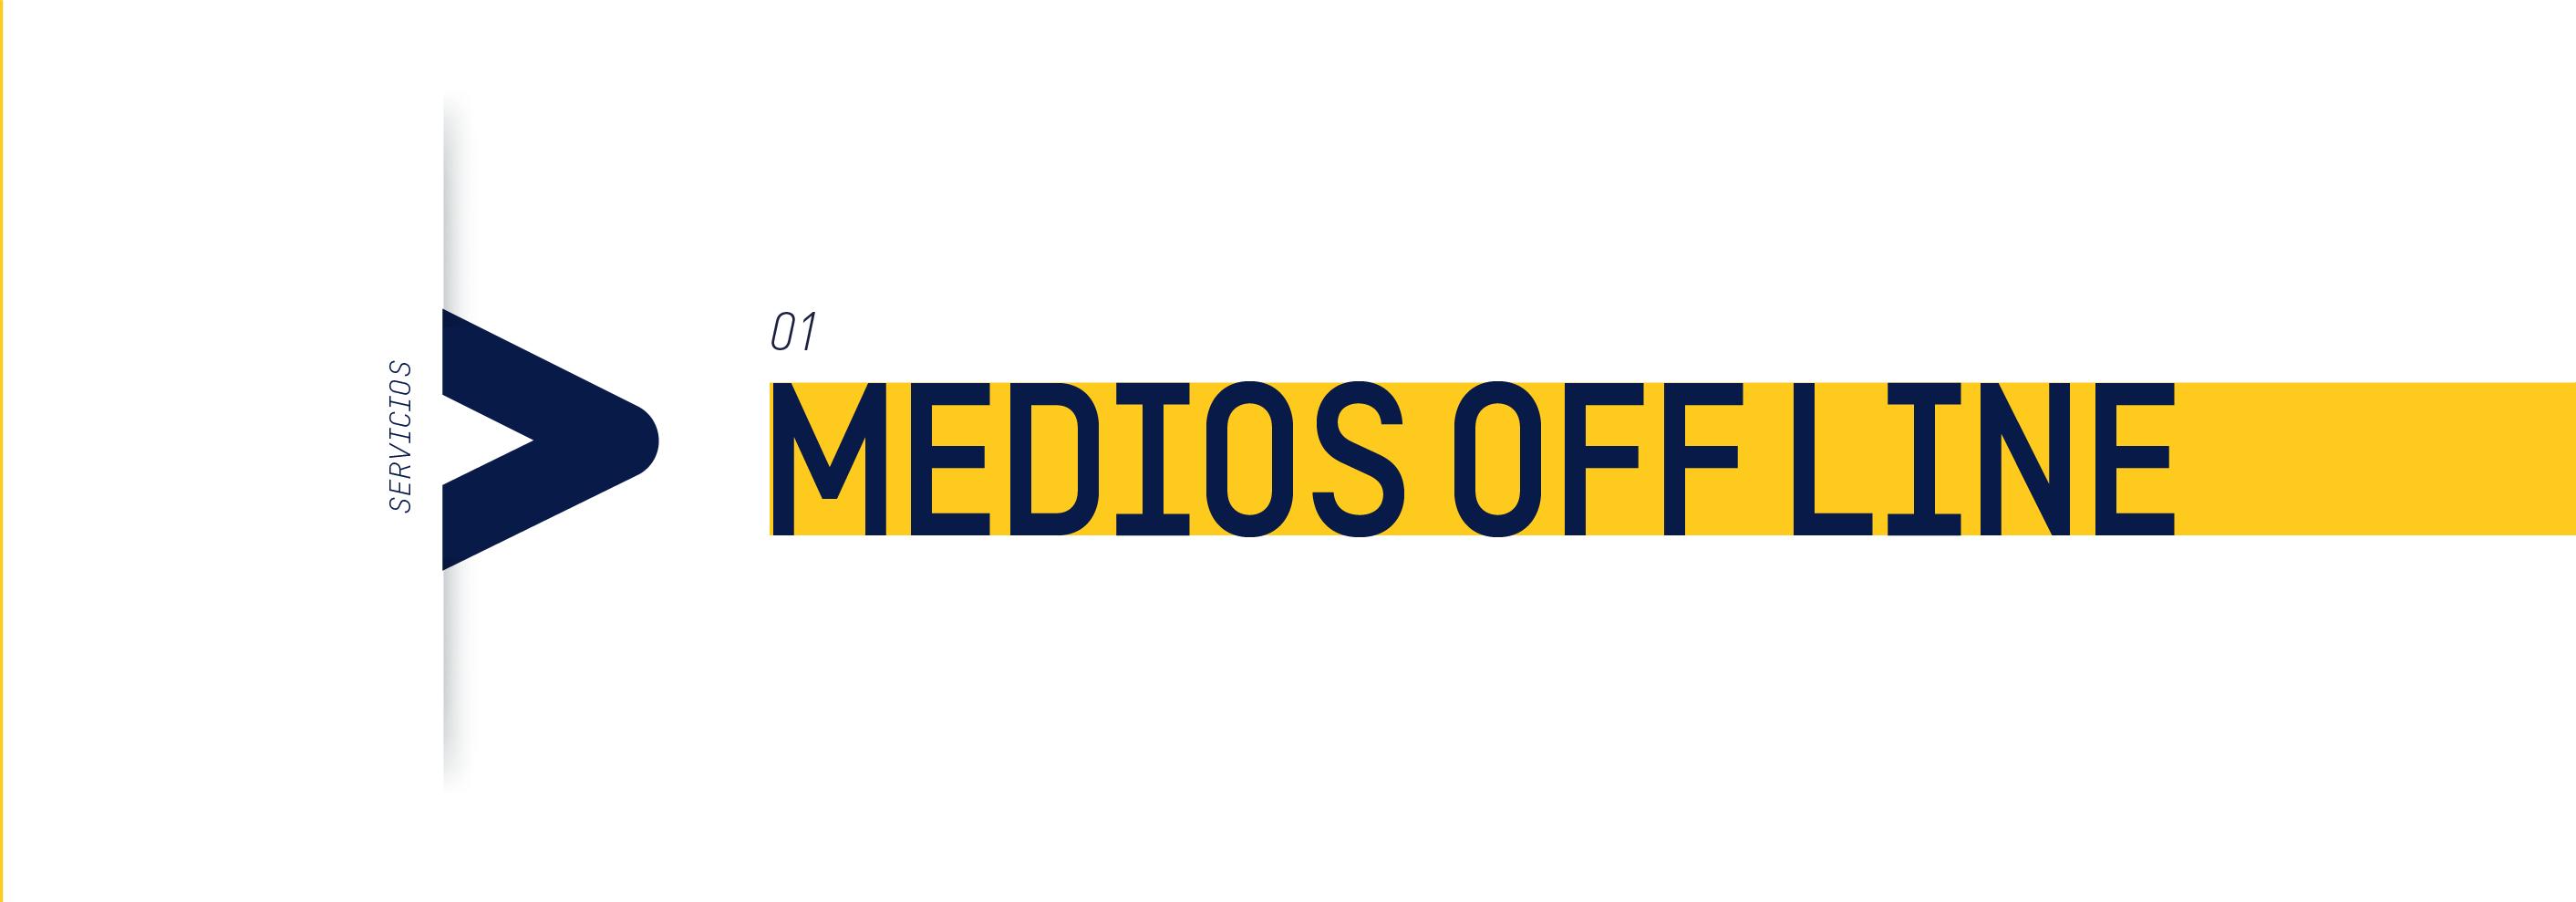 Cyma Comunicación Servicios: Medios Off line